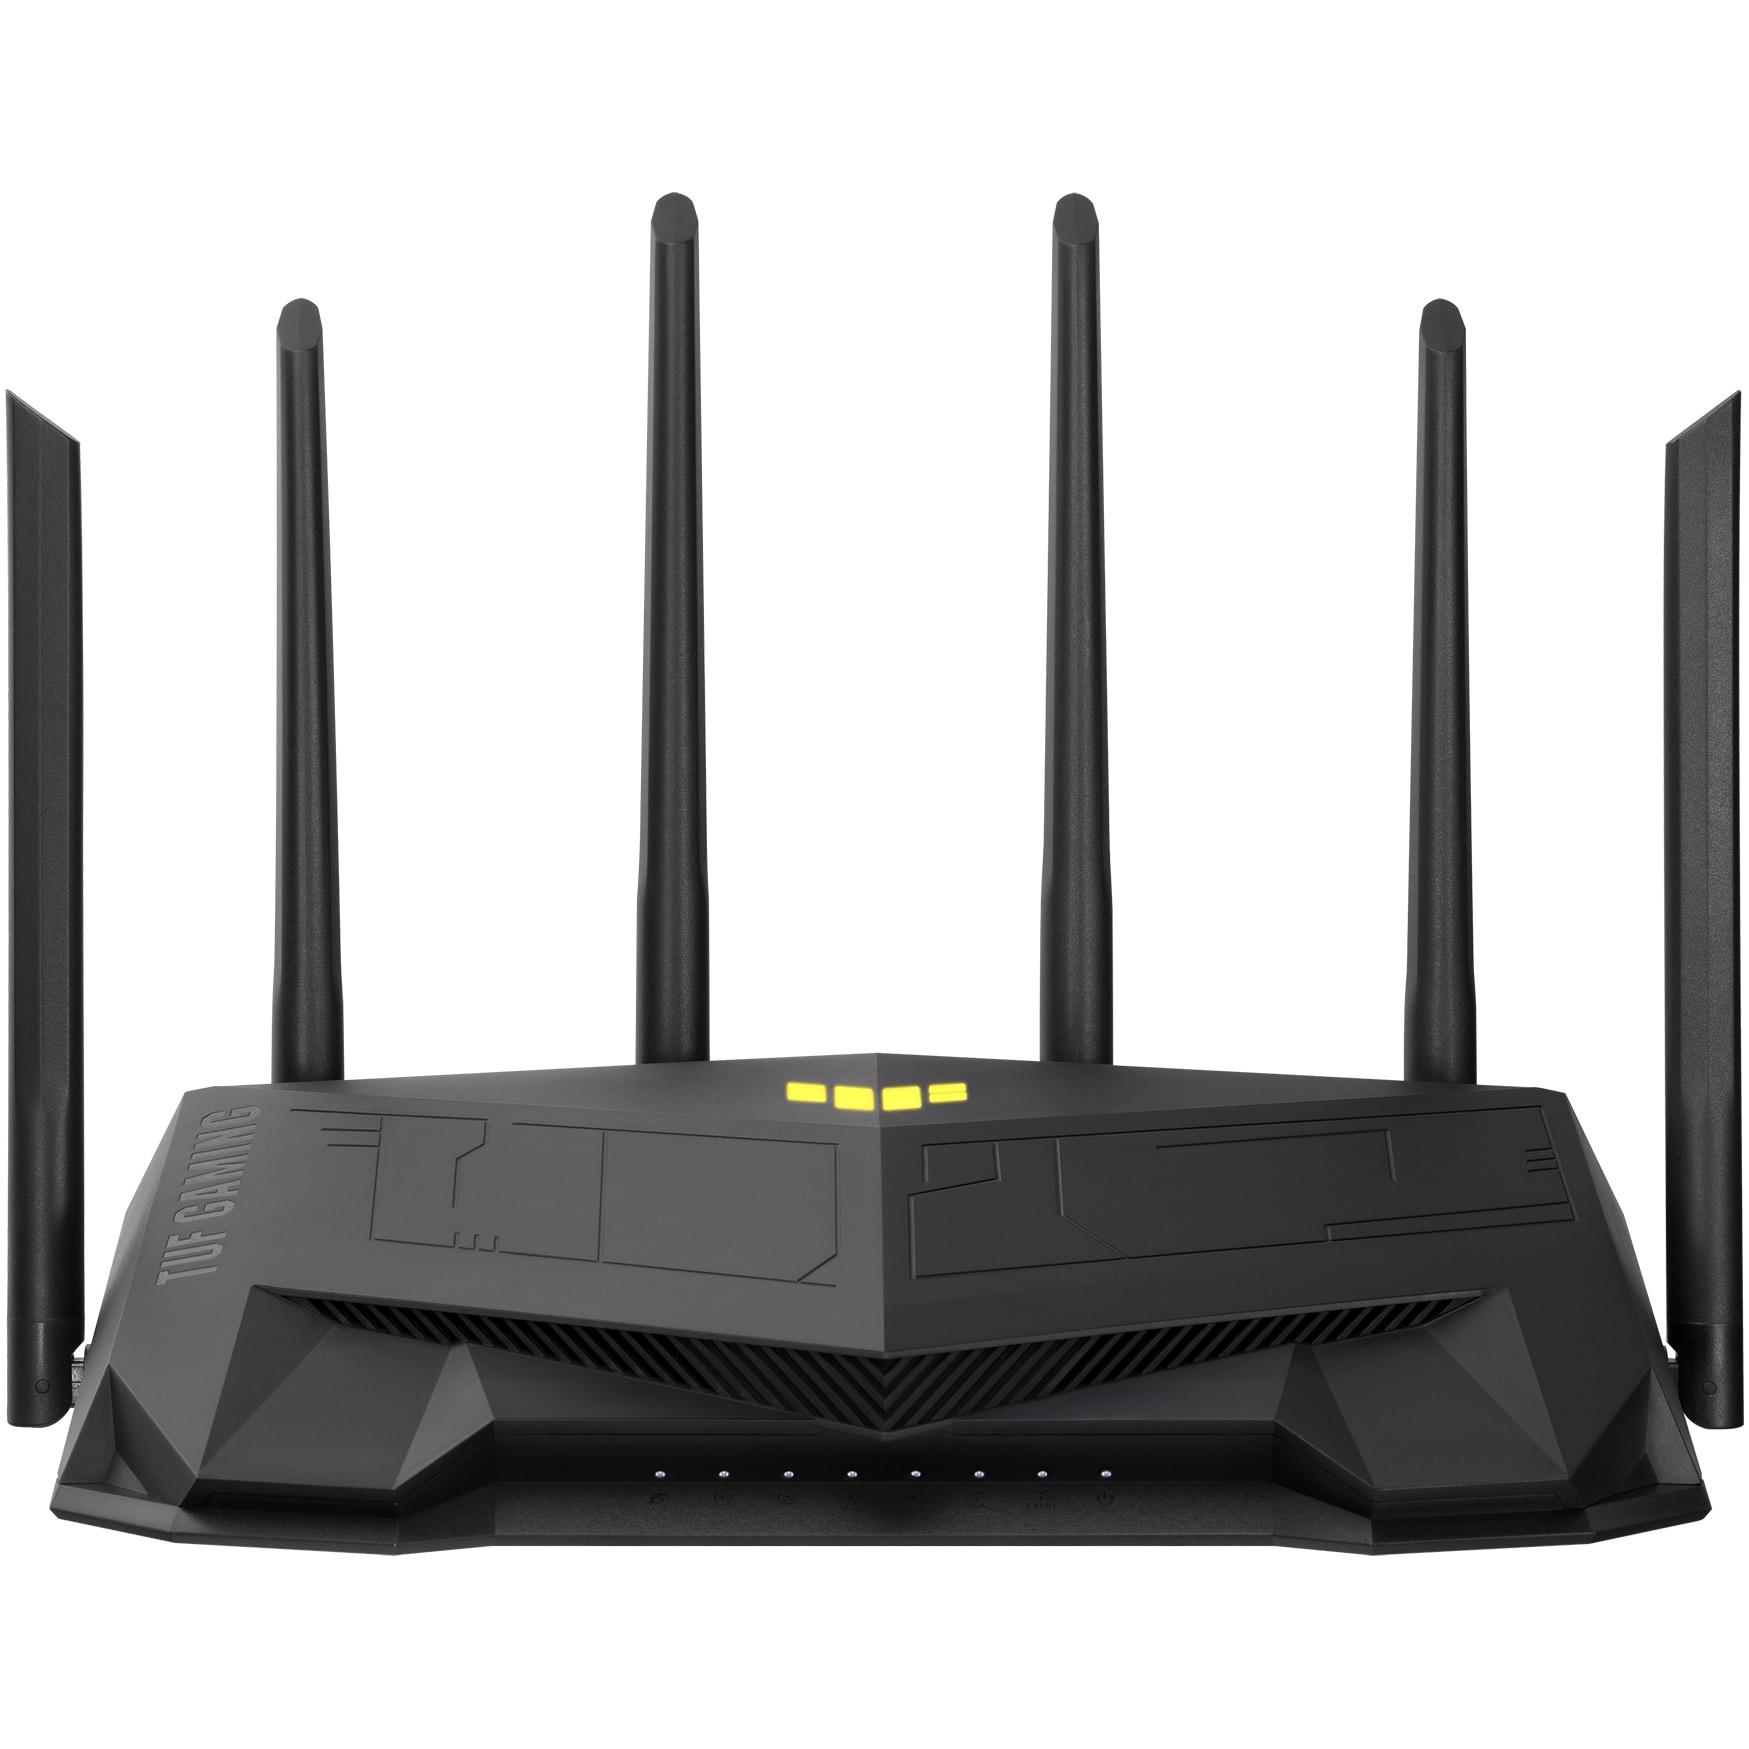 Fotografie Router gaming wireless ASUS TUF-AX5400, AX5400, WiFi 6, MU-MIMO, port gaming dedicat, 6 antene Wi-Fi